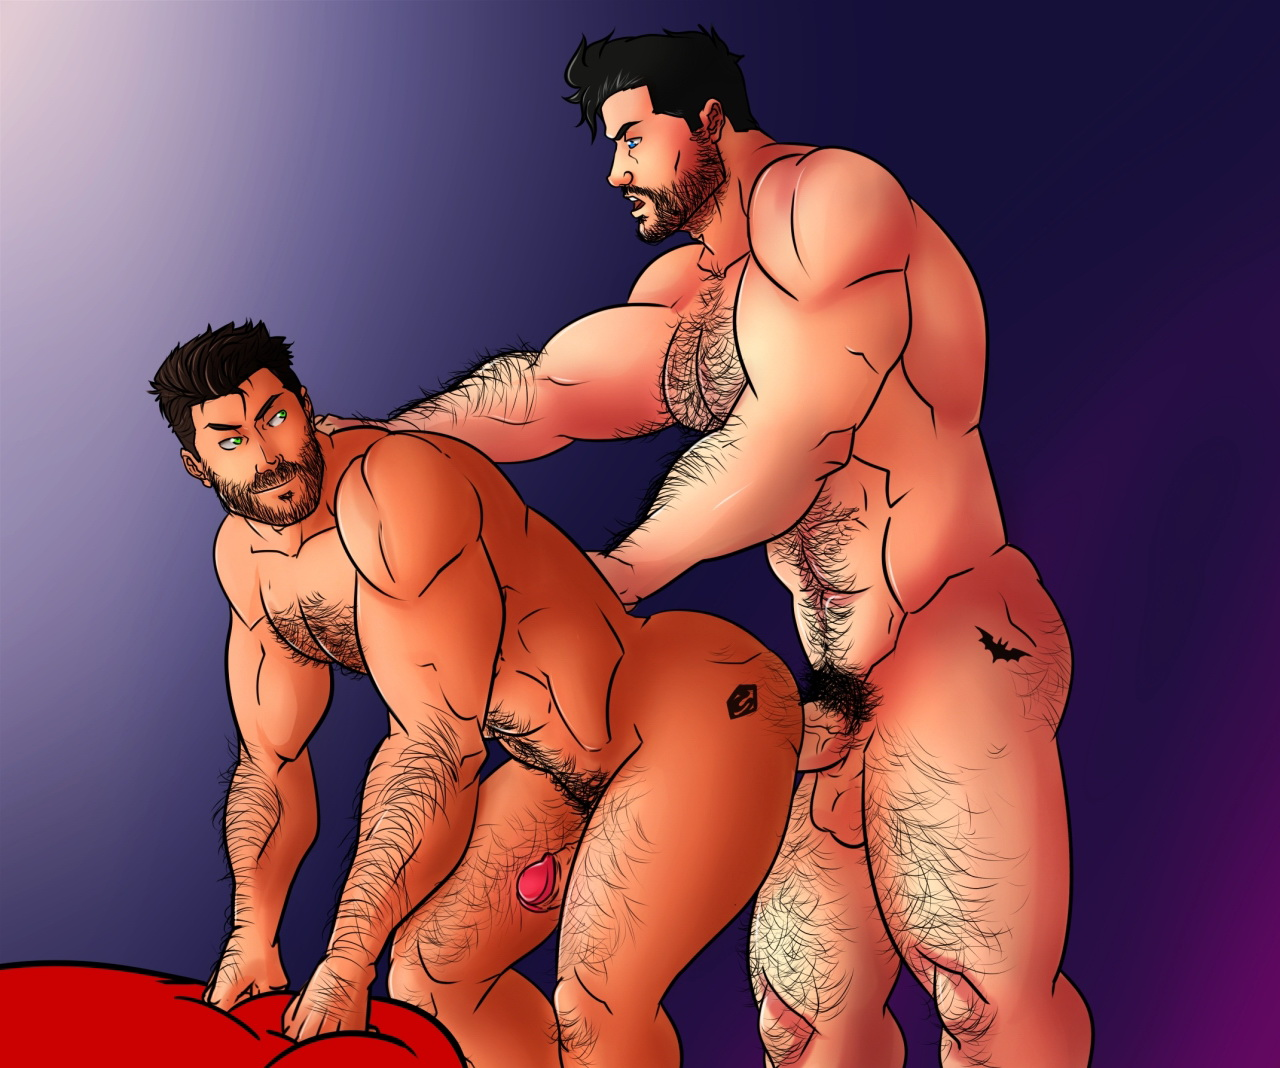 eroticheskie-flesh-gey-igri